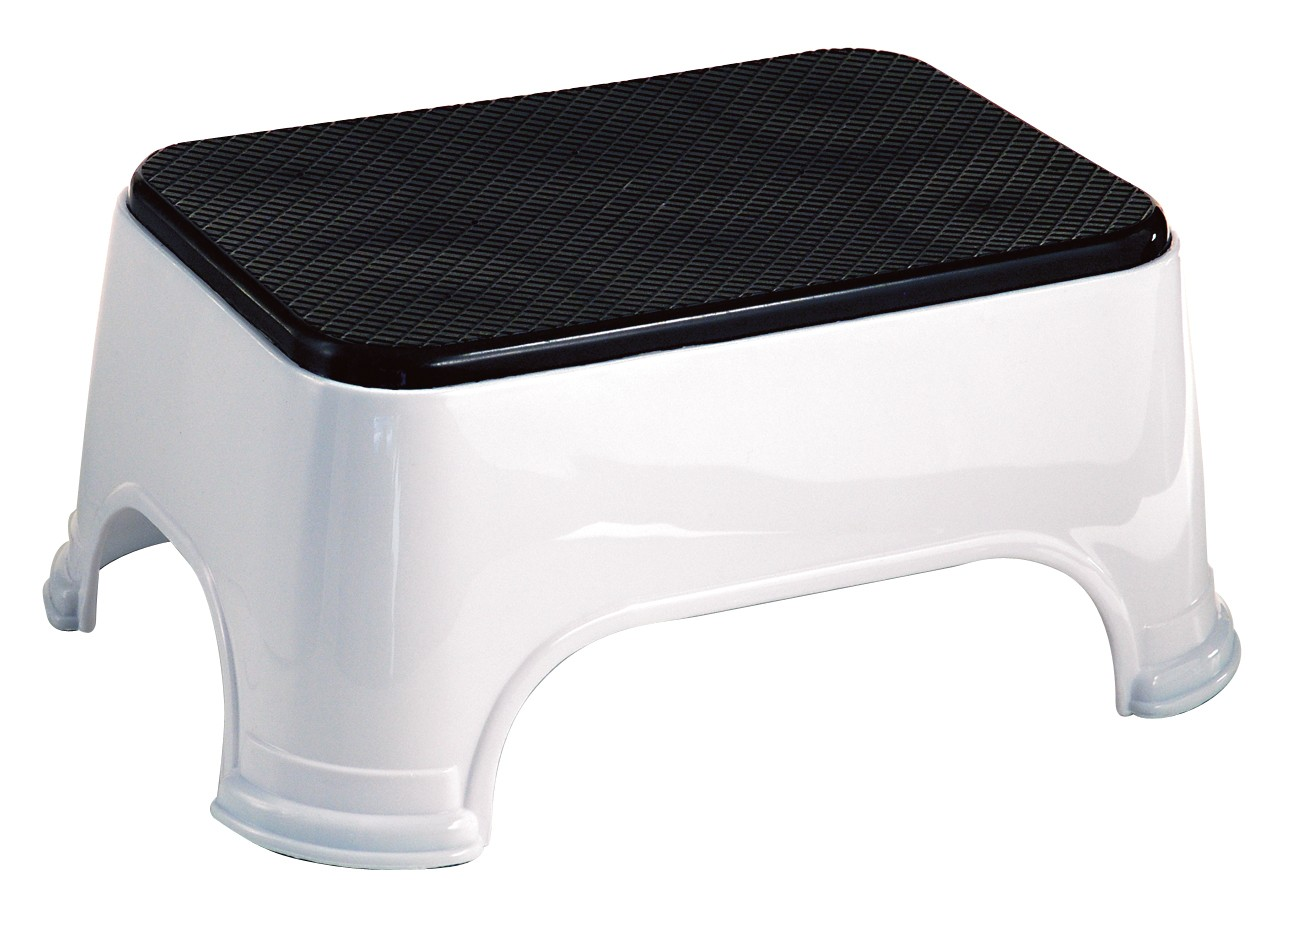 Plastic Stool Nz Bar Stools : step stool non slip white black from stools.beautytipsqueen.com size 1299 x 933 jpeg 146kB